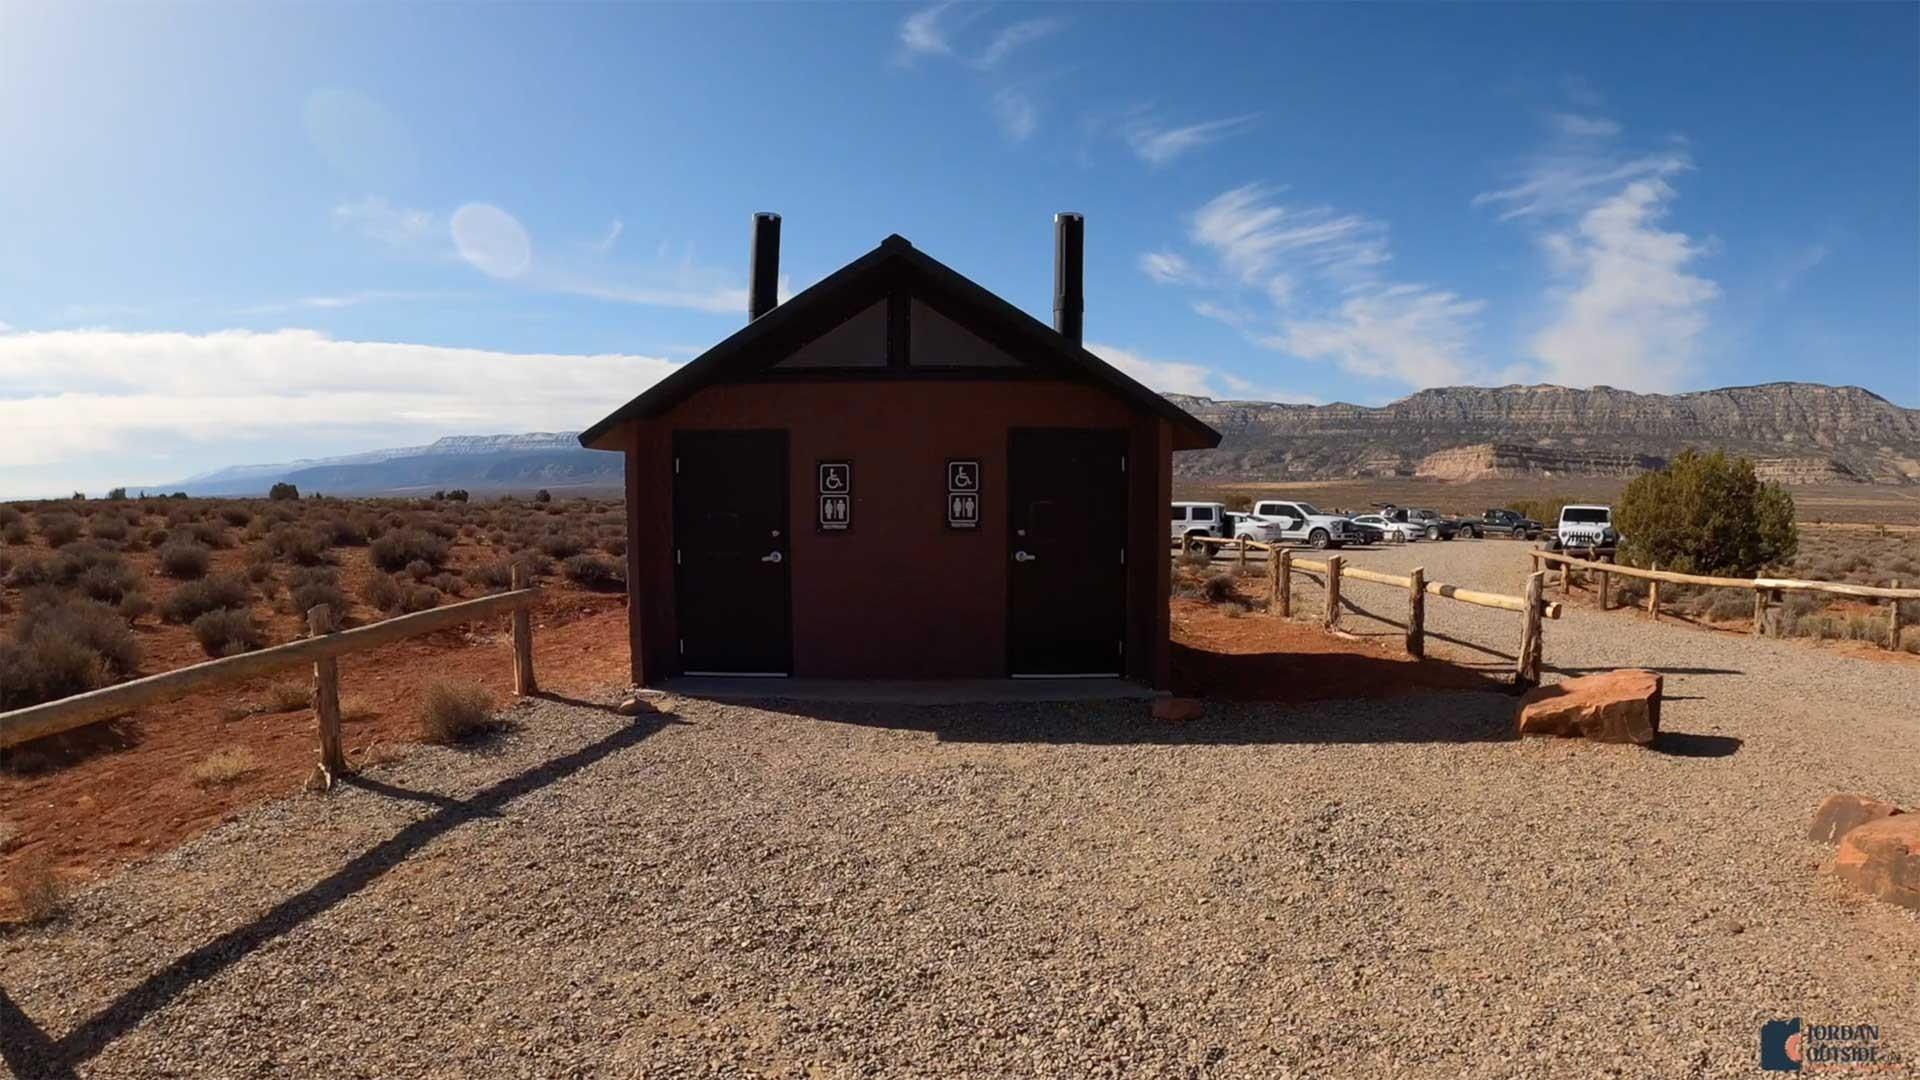 The Dry Fork Trailhead Bathrooms